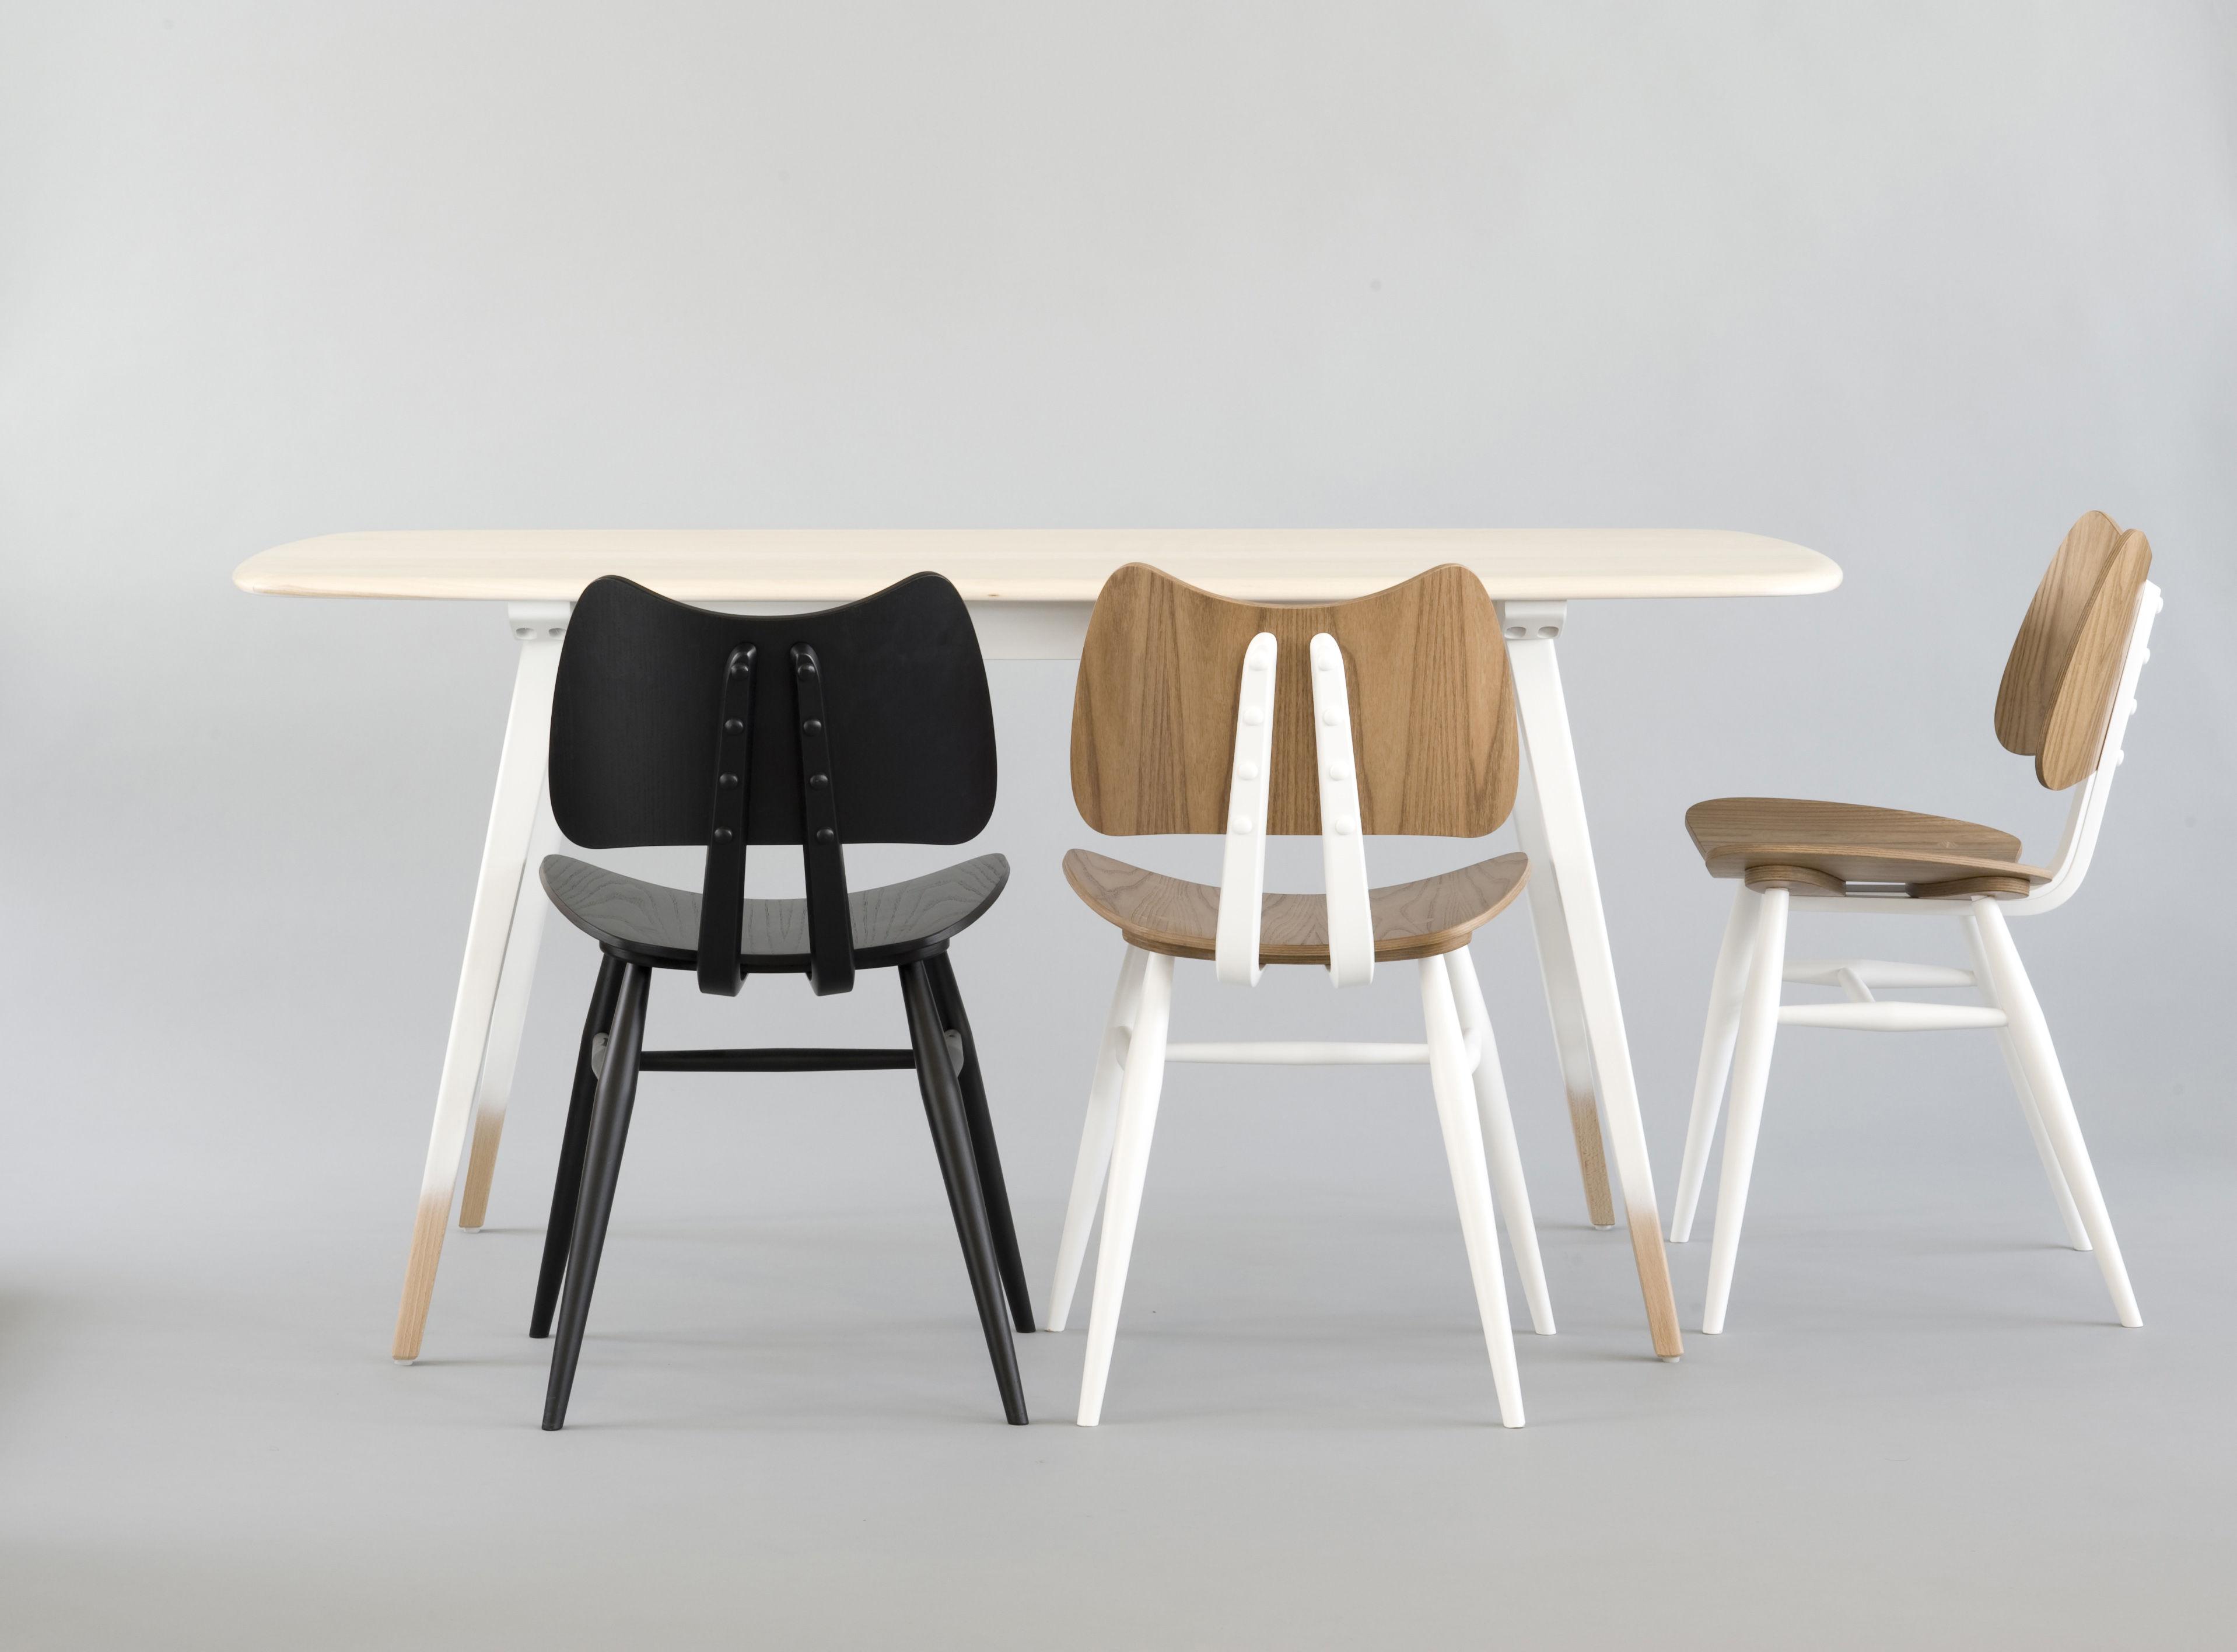 chaise butterfly bois r dition 1958 noir ercol. Black Bedroom Furniture Sets. Home Design Ideas